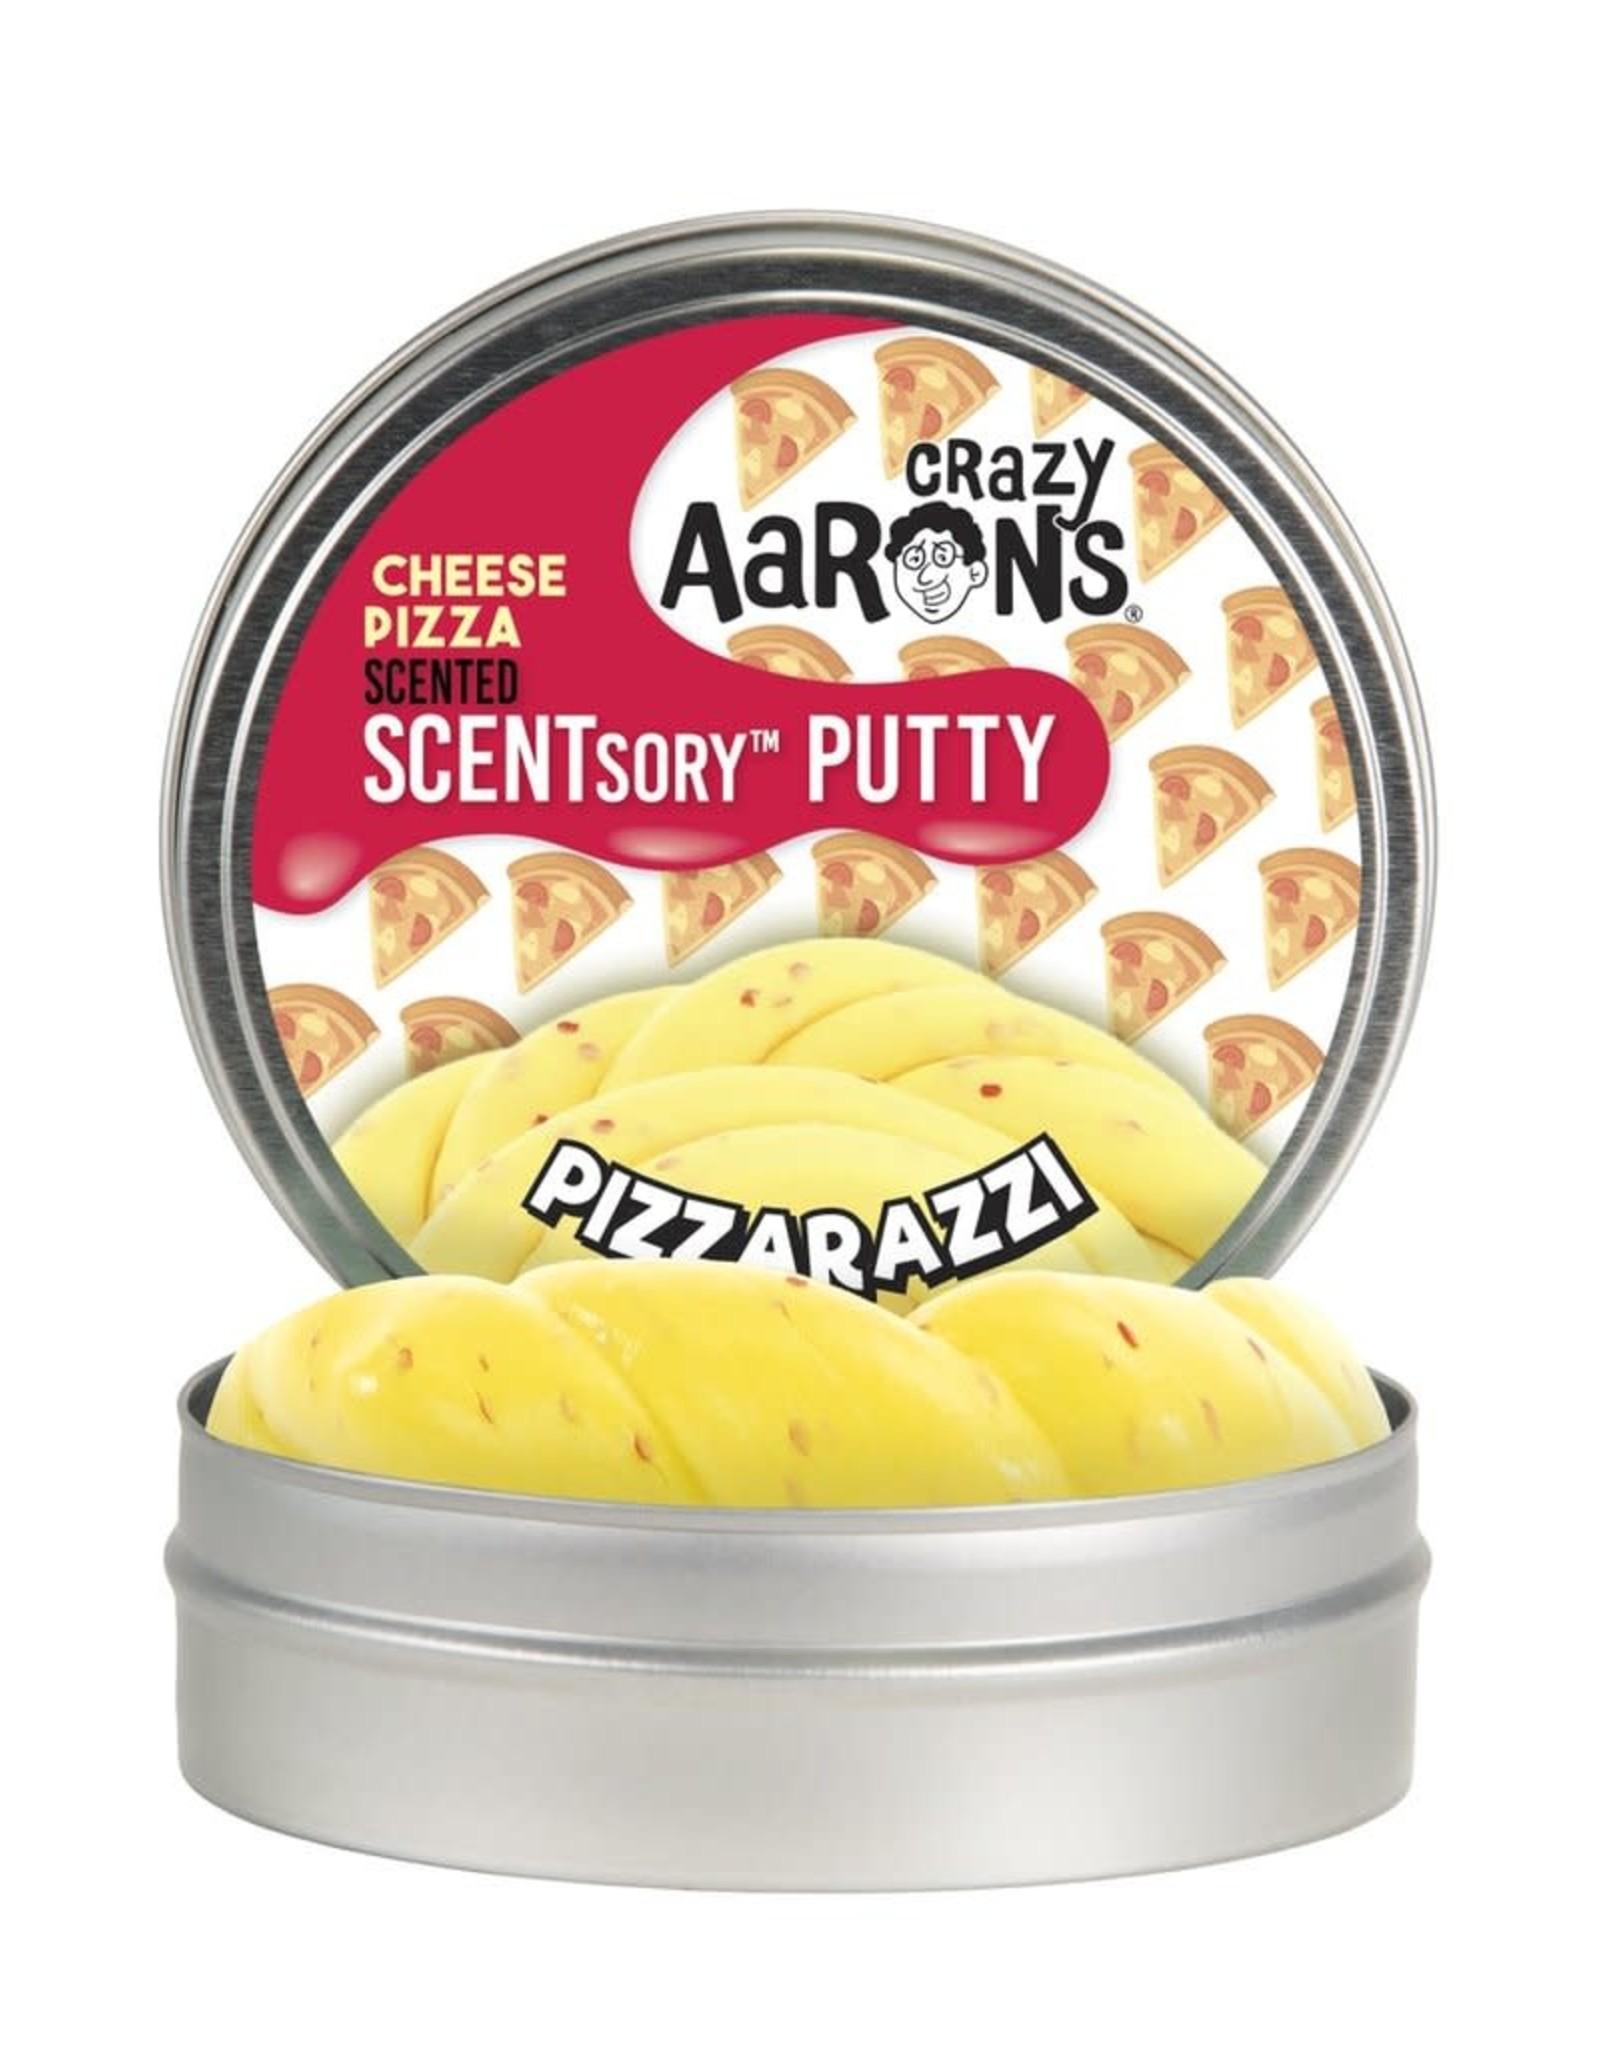 "Crazy Aaron's Scentsory Putty Pizzarazzi 2.75"""